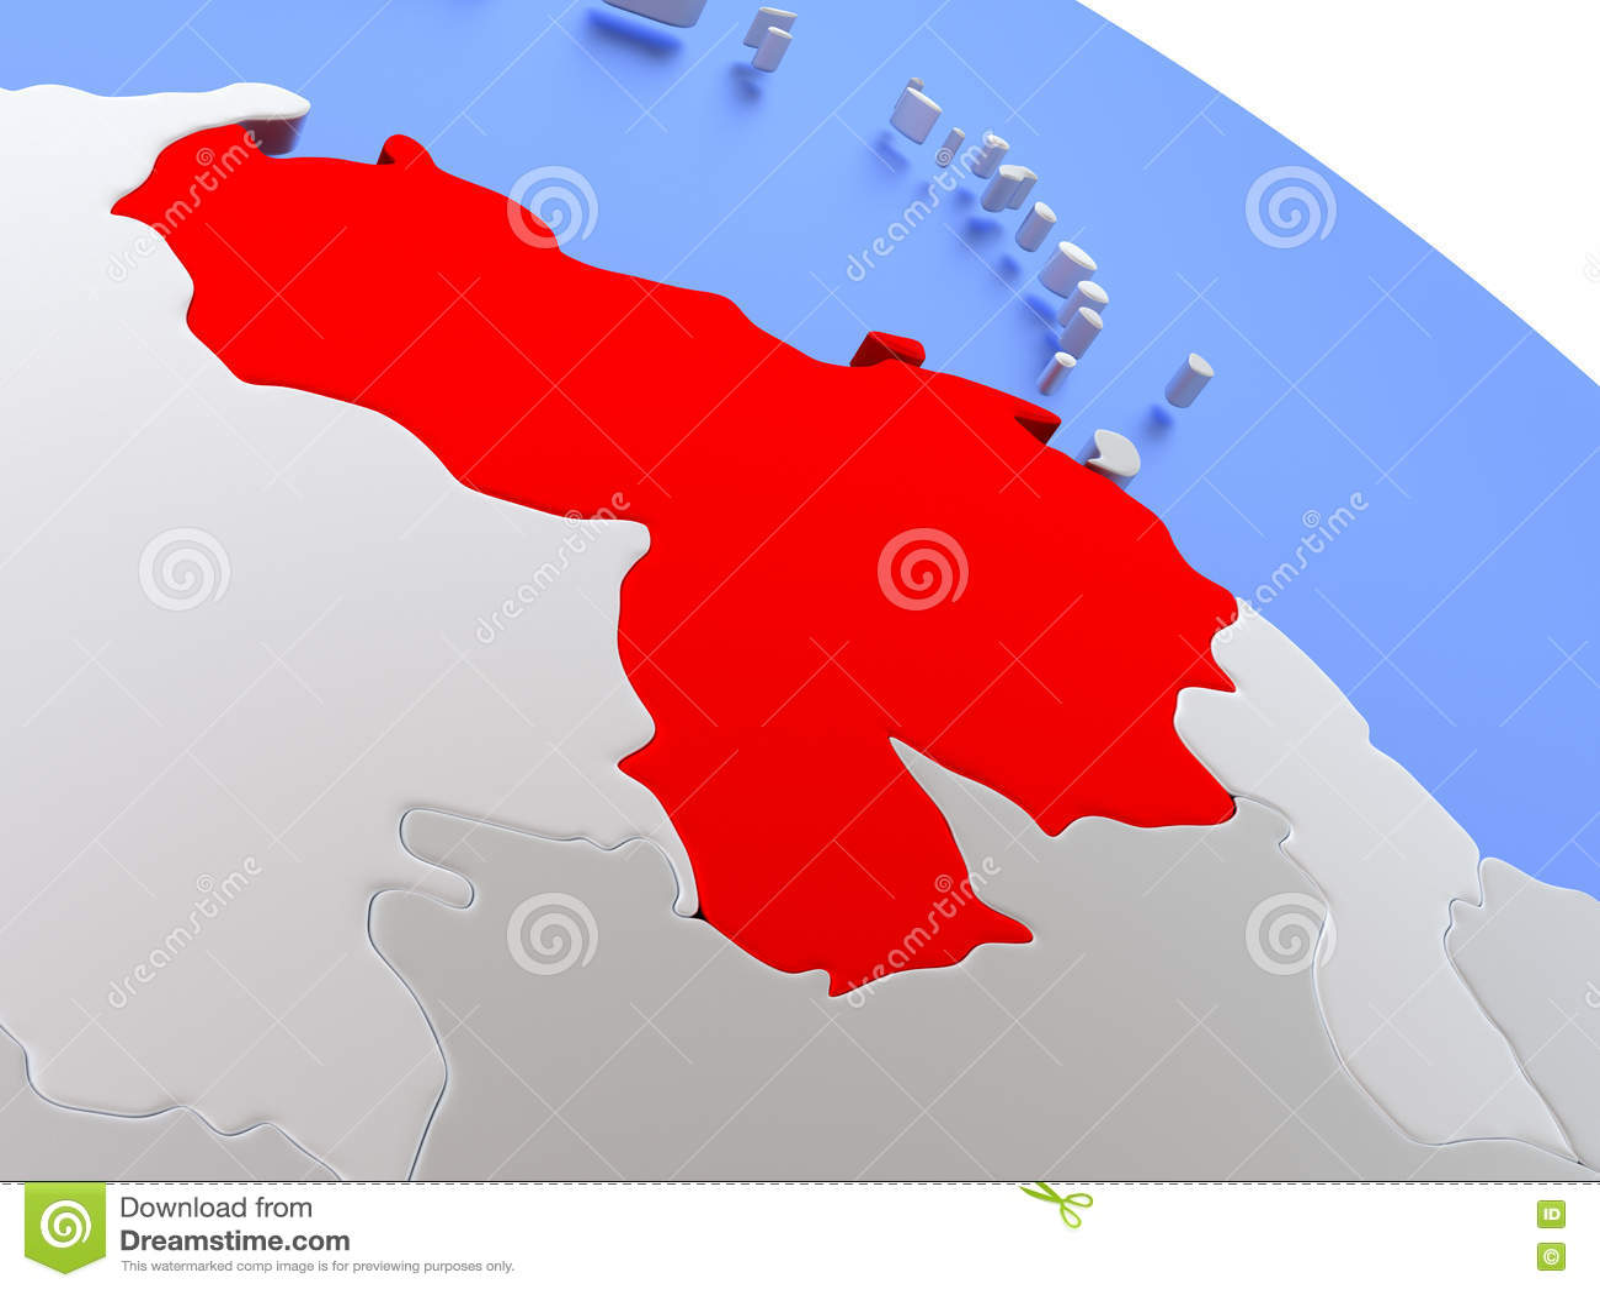 Venezuela on world map stock illustration. Illustration of ...